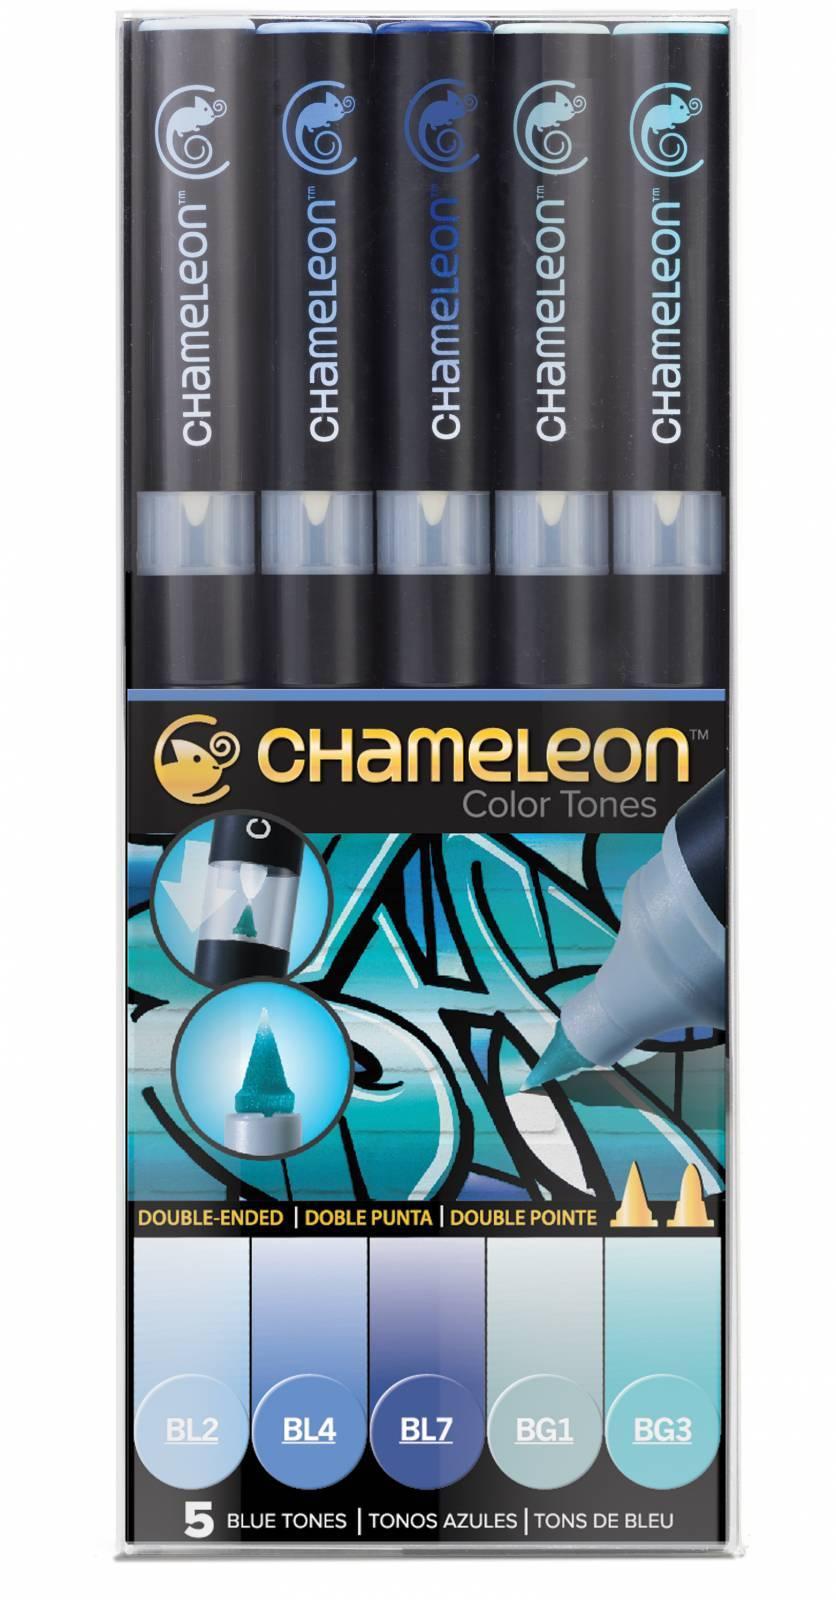 Kit Chameleon 5 canetas - Tons de Azul - Papelaria Botafogo